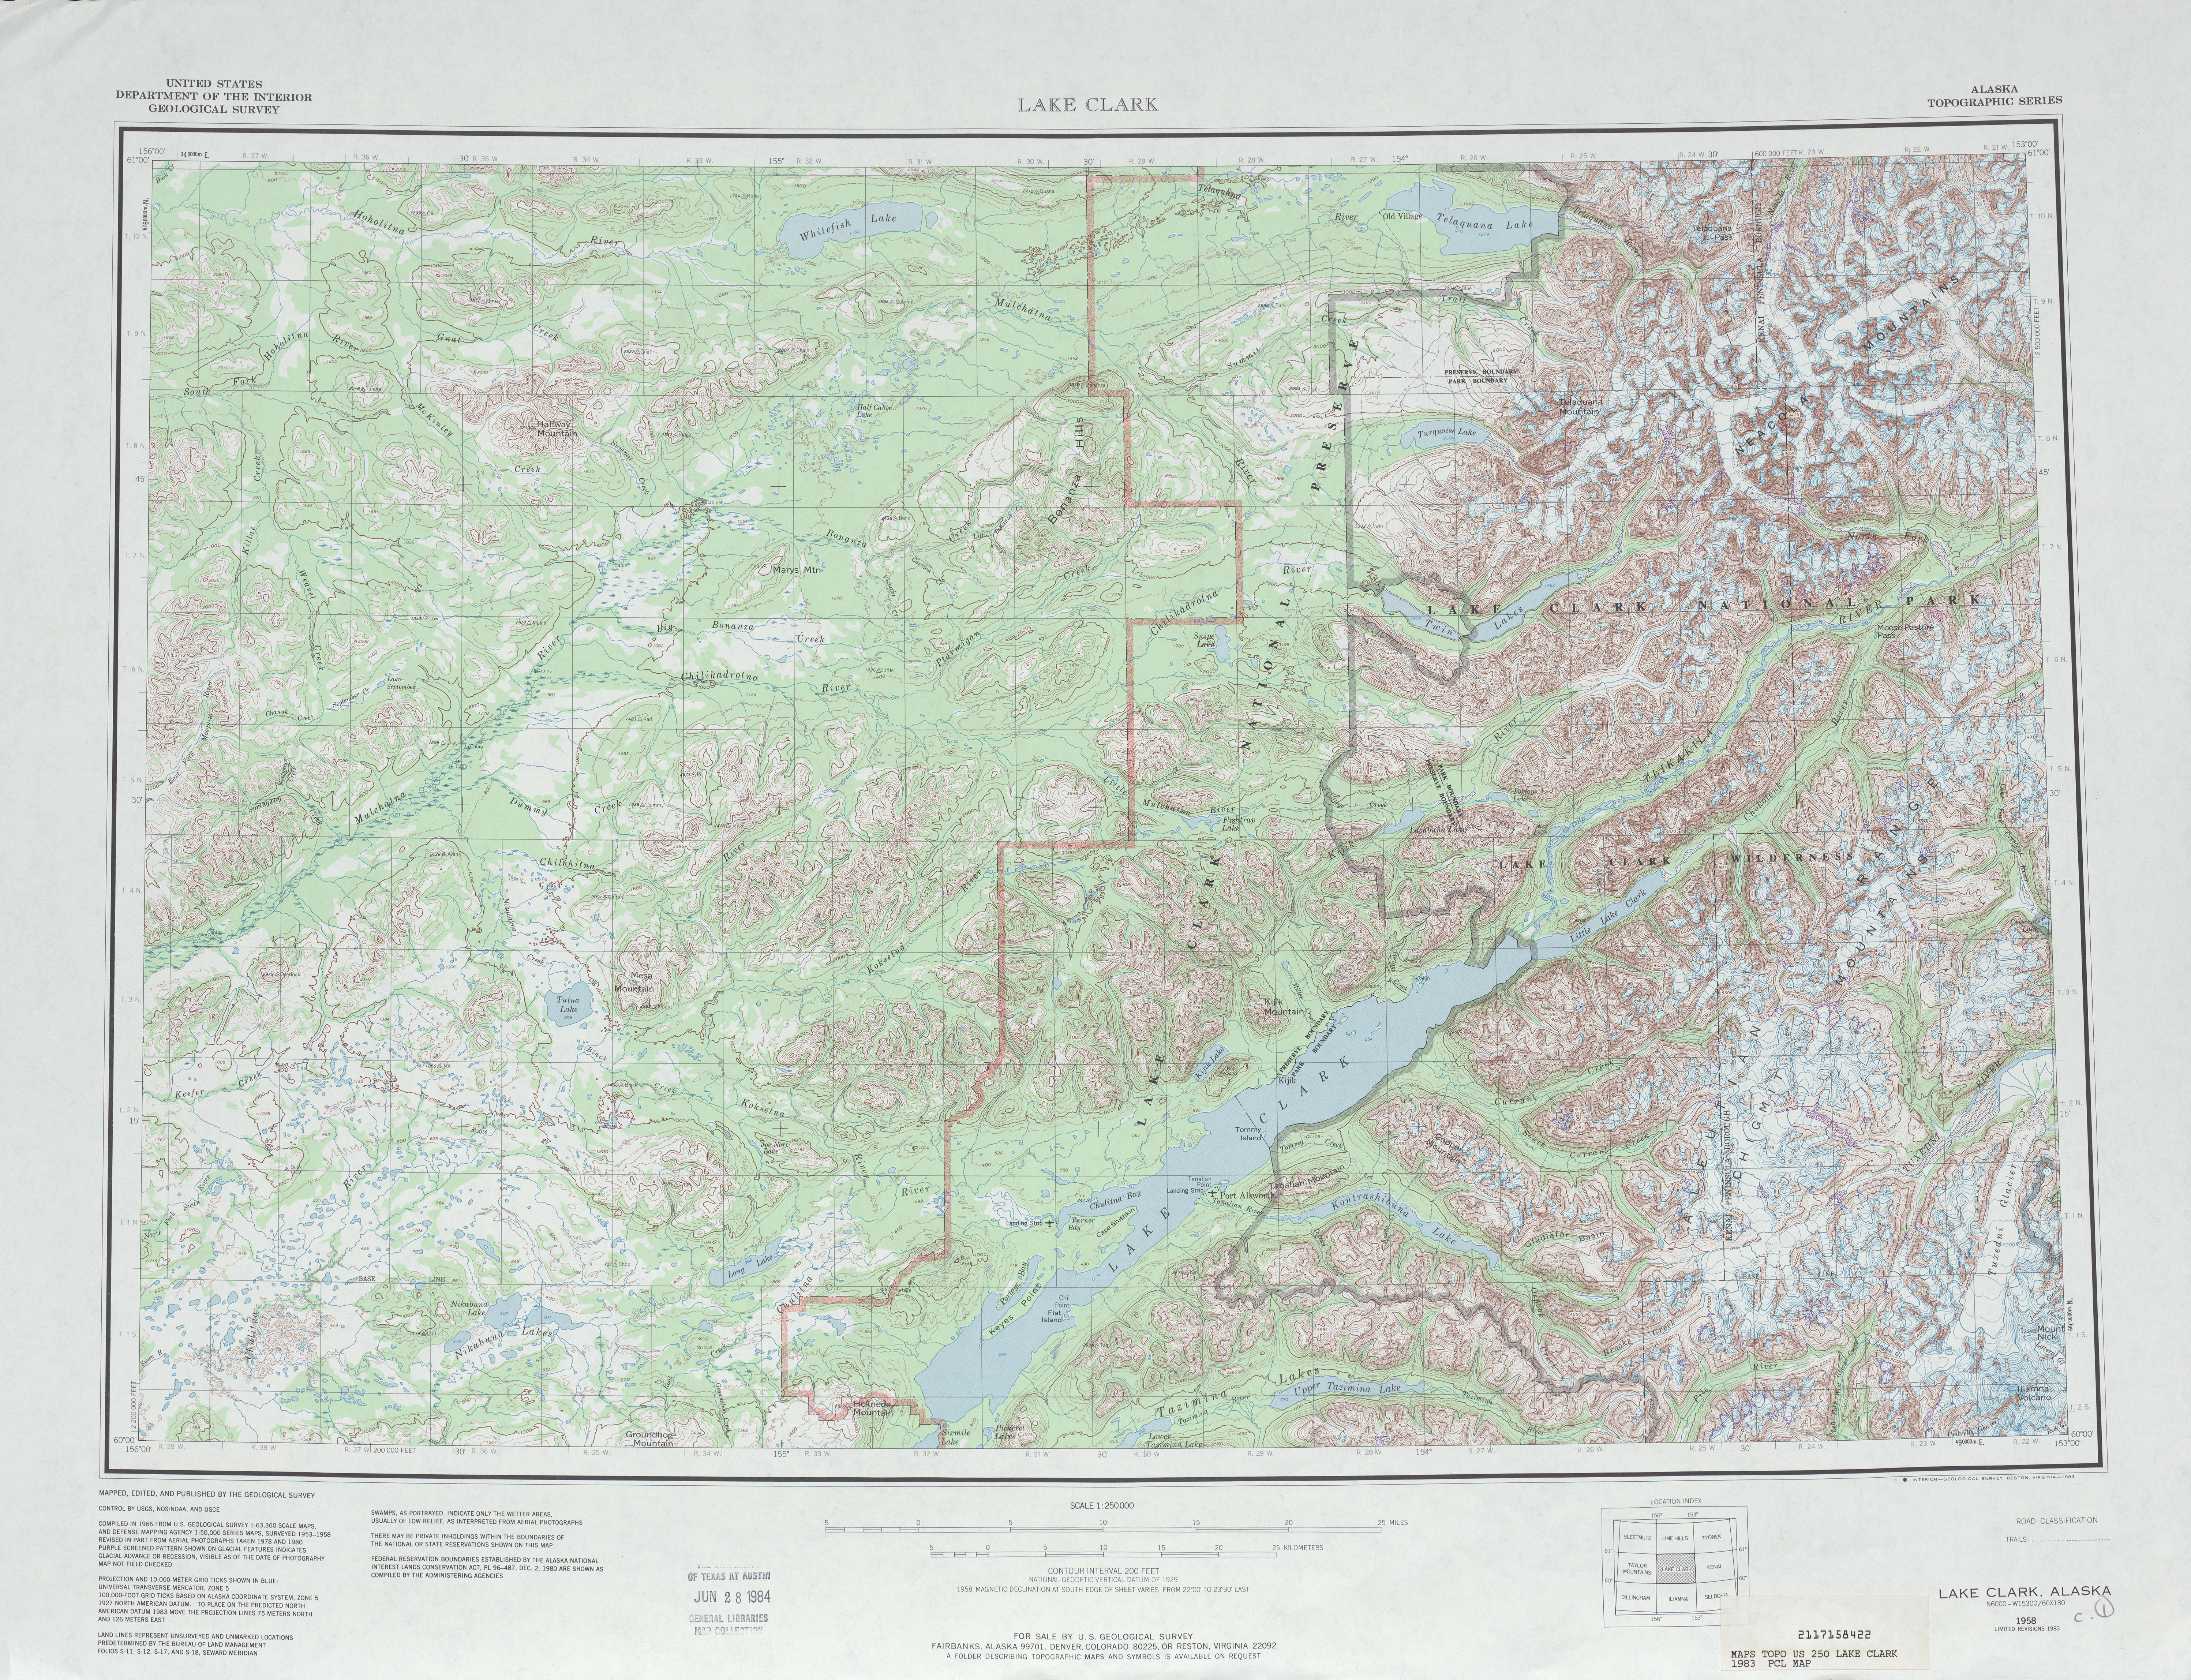 Lake Clark Topographic Map Sheet, United States 1983